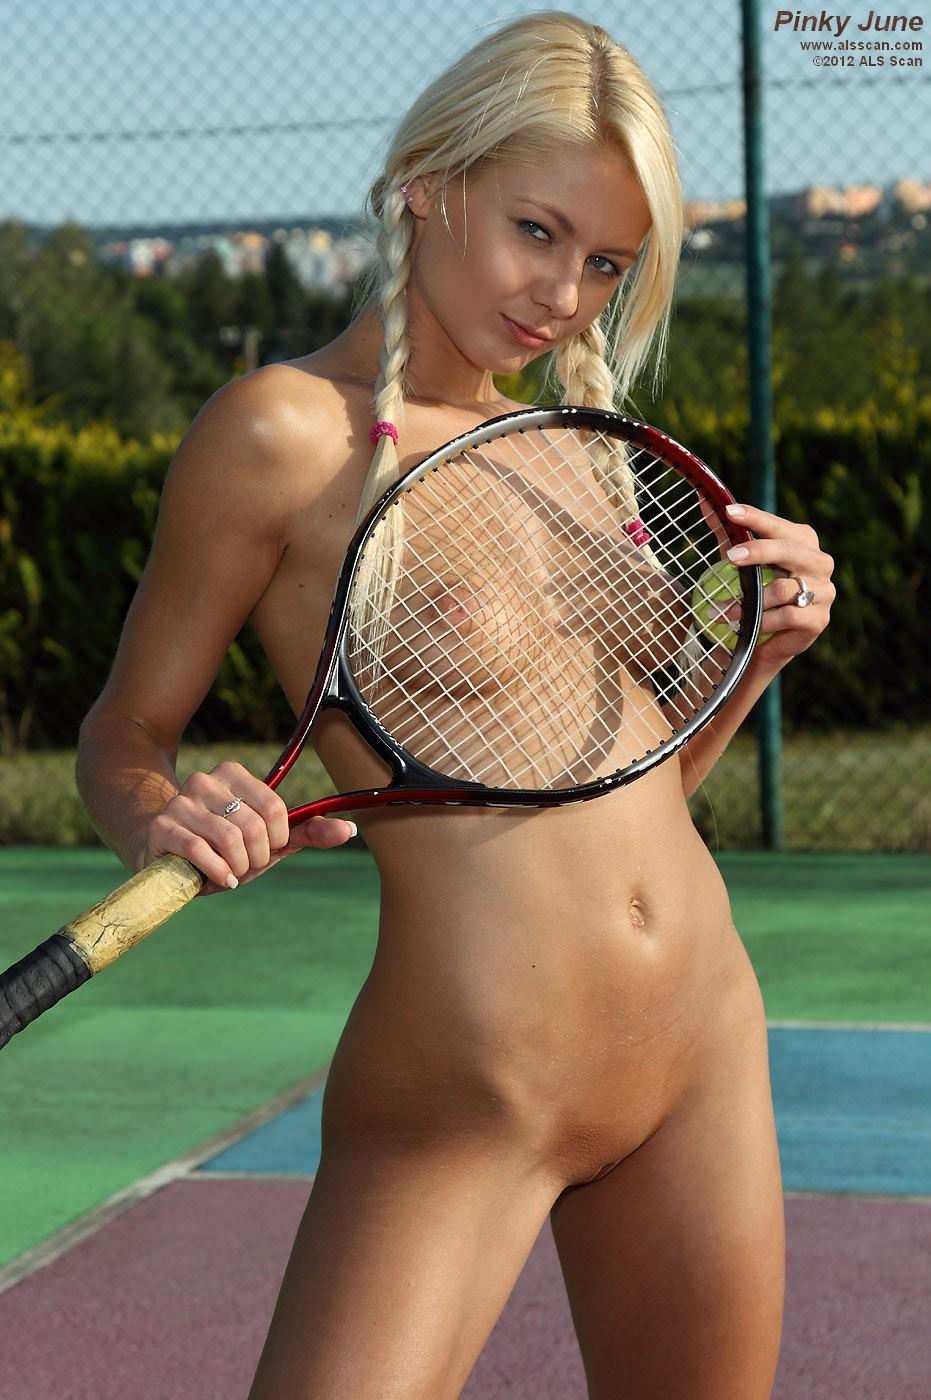 pinky june tennis